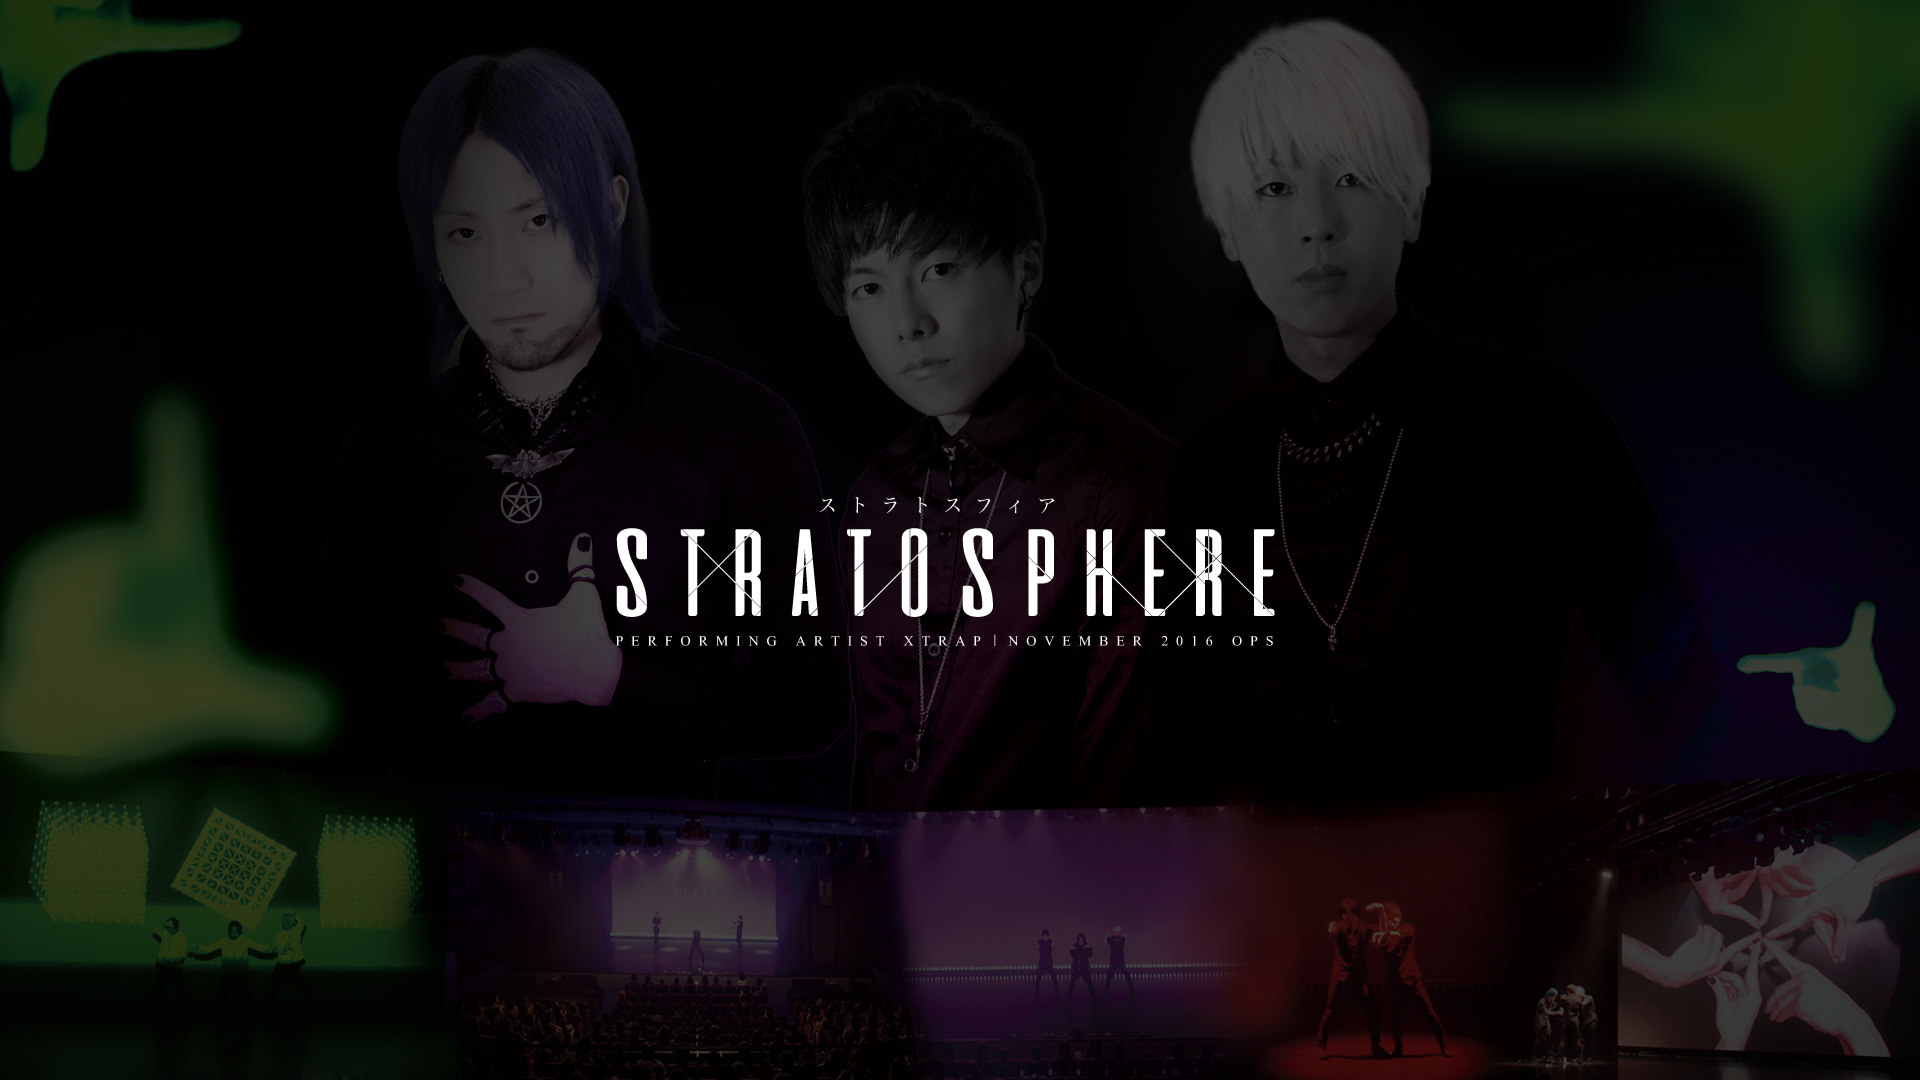 XTRAPワンマンライブ「STRATOSPHERE」 | 2016年11月13日(日)(終了)